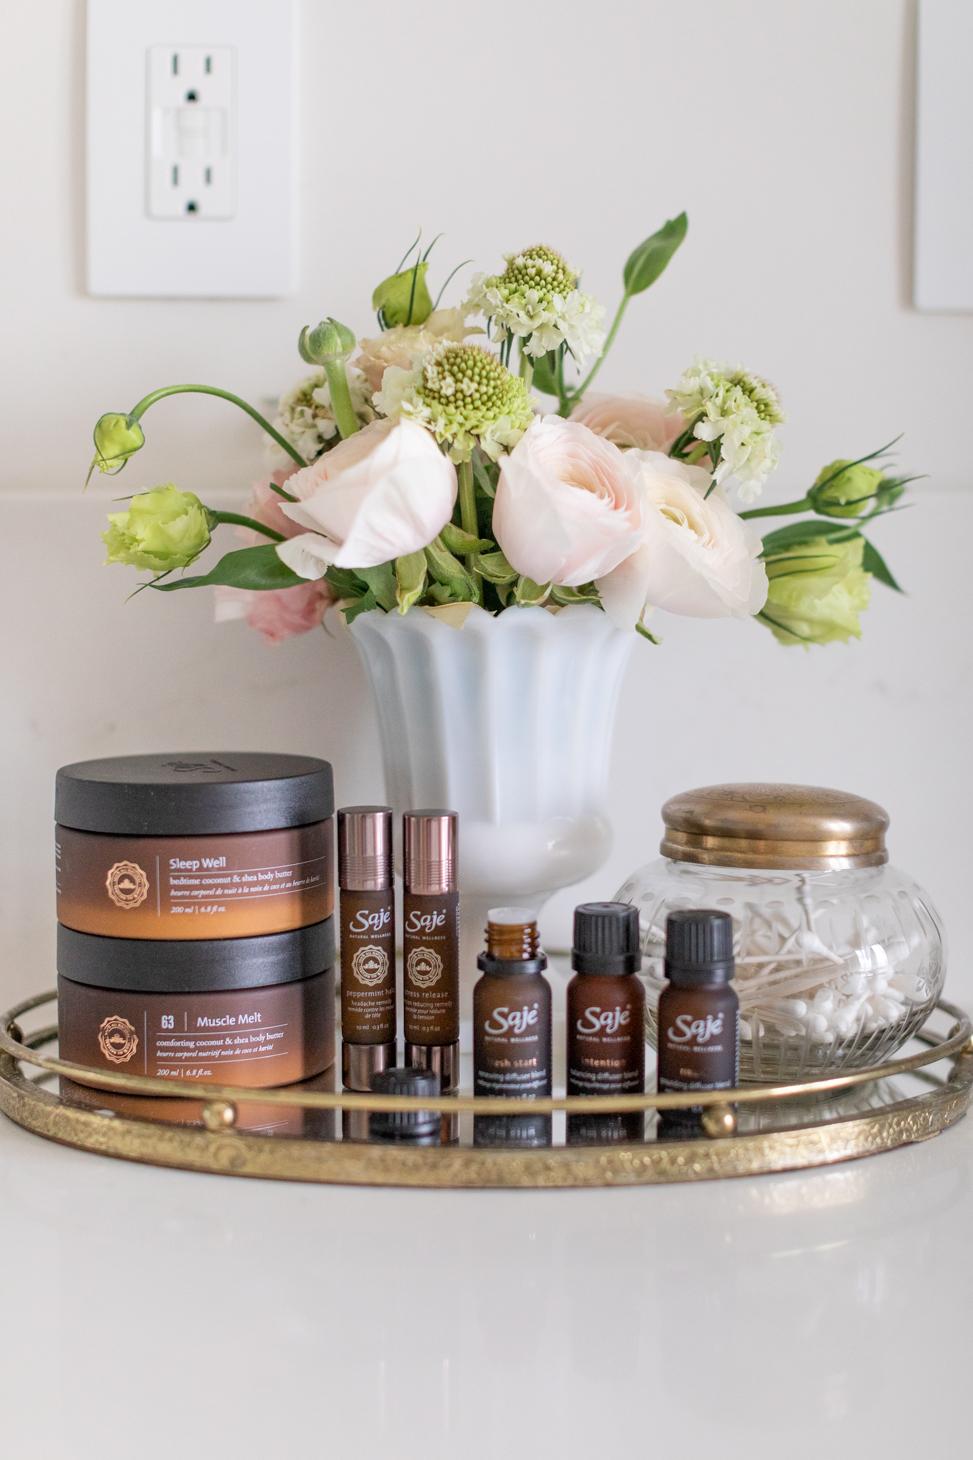 Jillian Harris favourite Saje Wellness Products to promote Self-Care